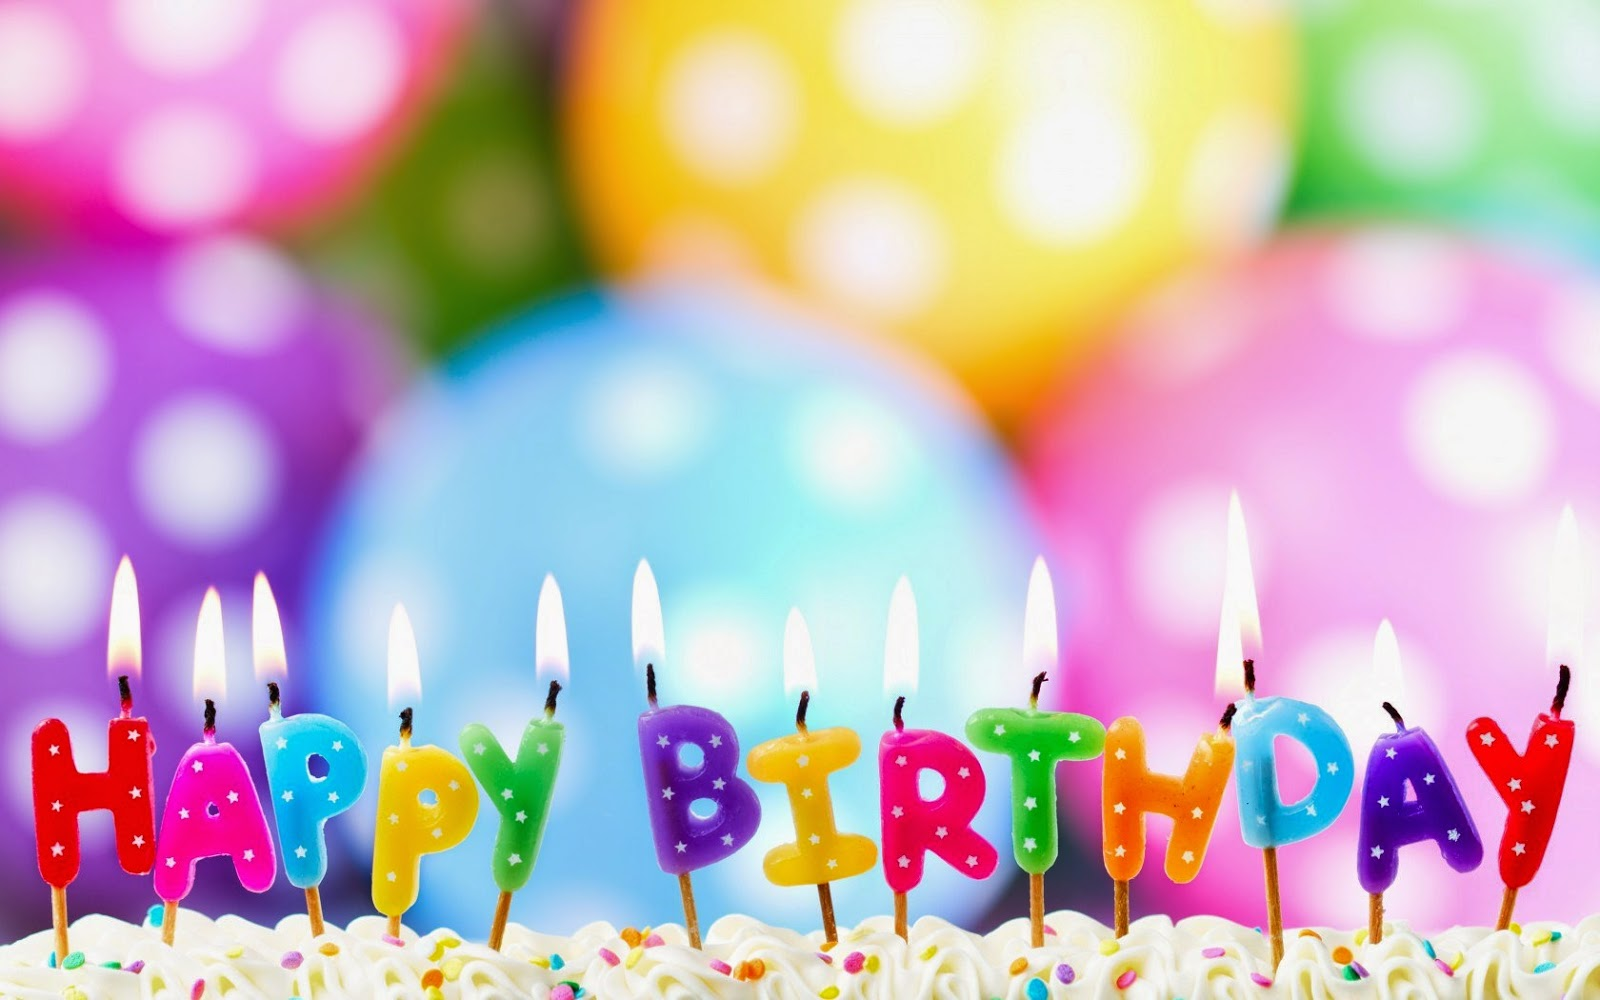 http://aliexpressers.ru/wp-content/uploads/2016/03/1-1-happy-birthday.jpg